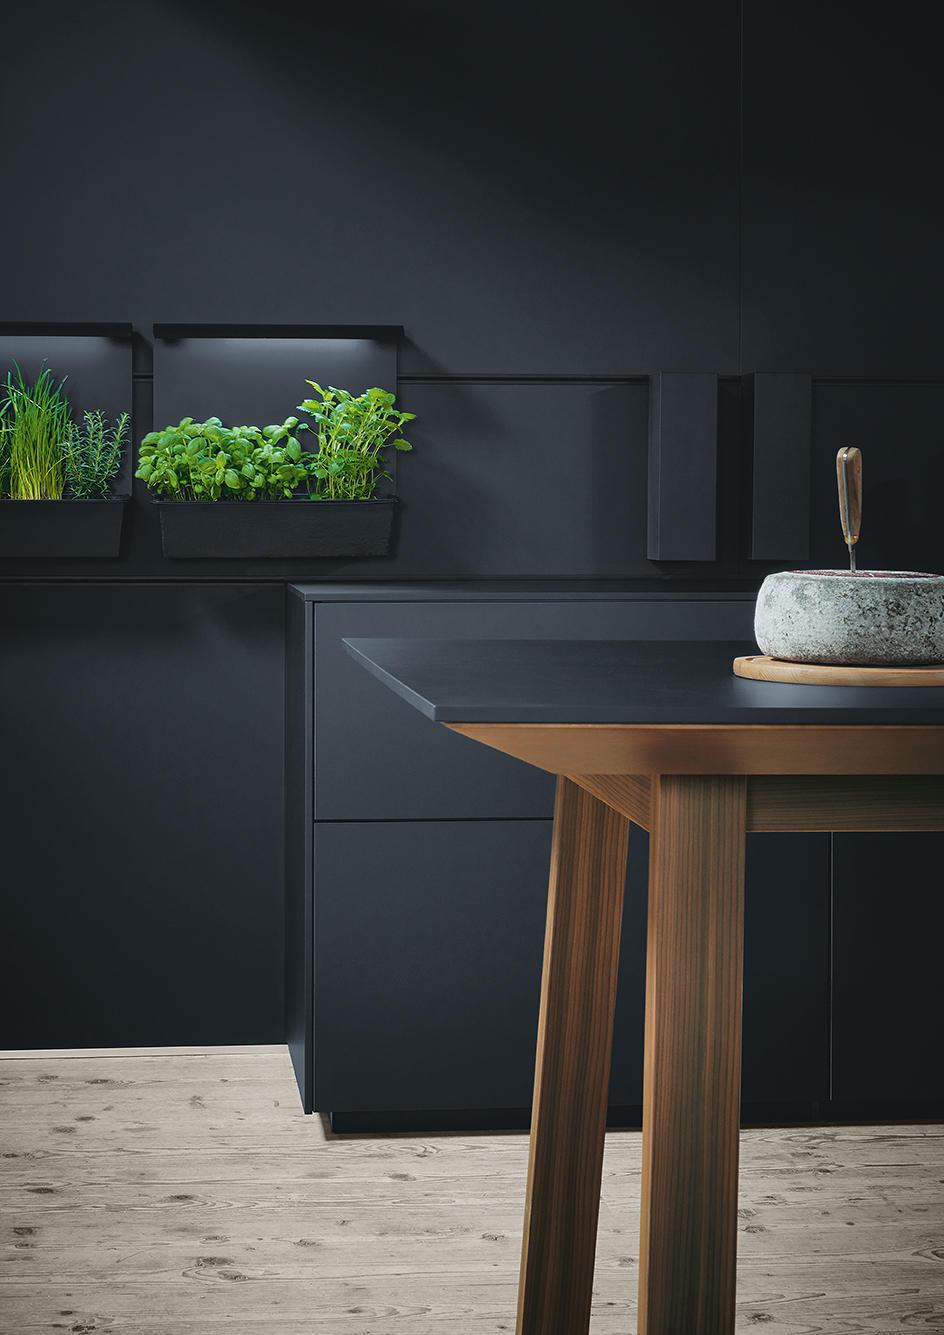 The living kitchen: next8